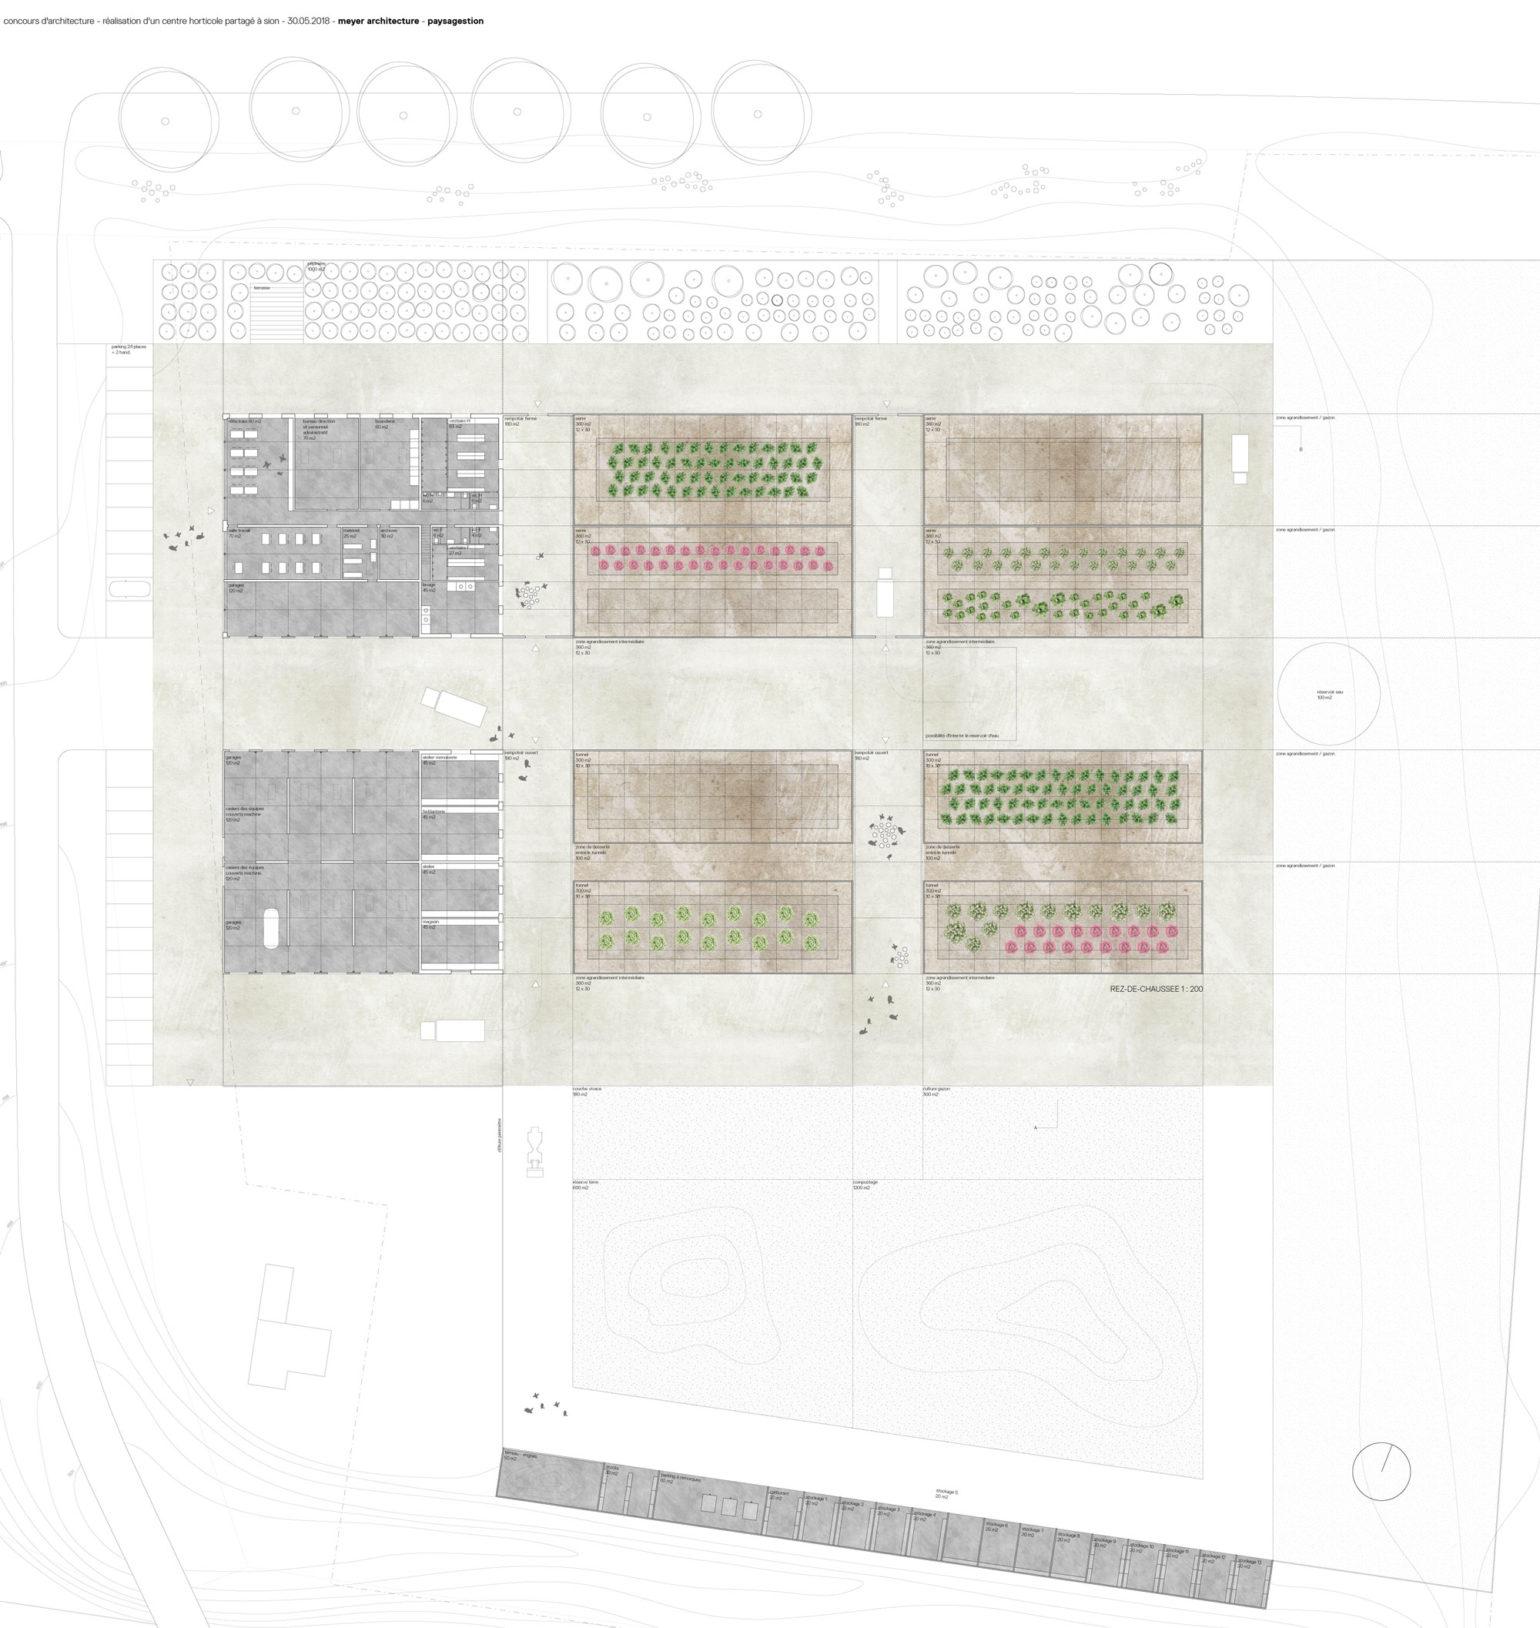 concours_centre_horticole_sion_meyer_architecture__sion_04